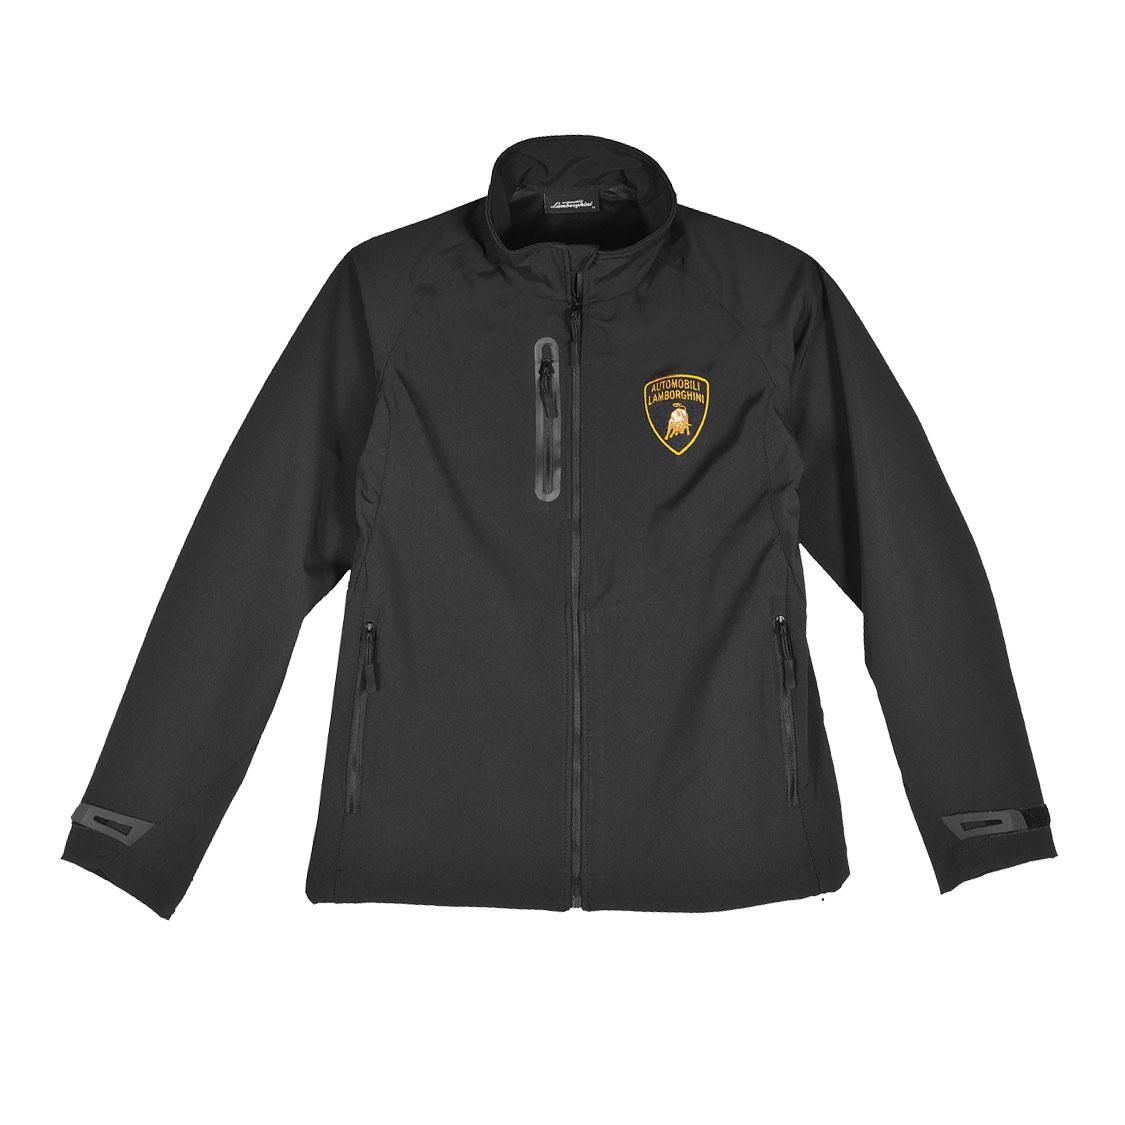 Lamborghini Men S Racing Team Softshell Zip Up Jacket